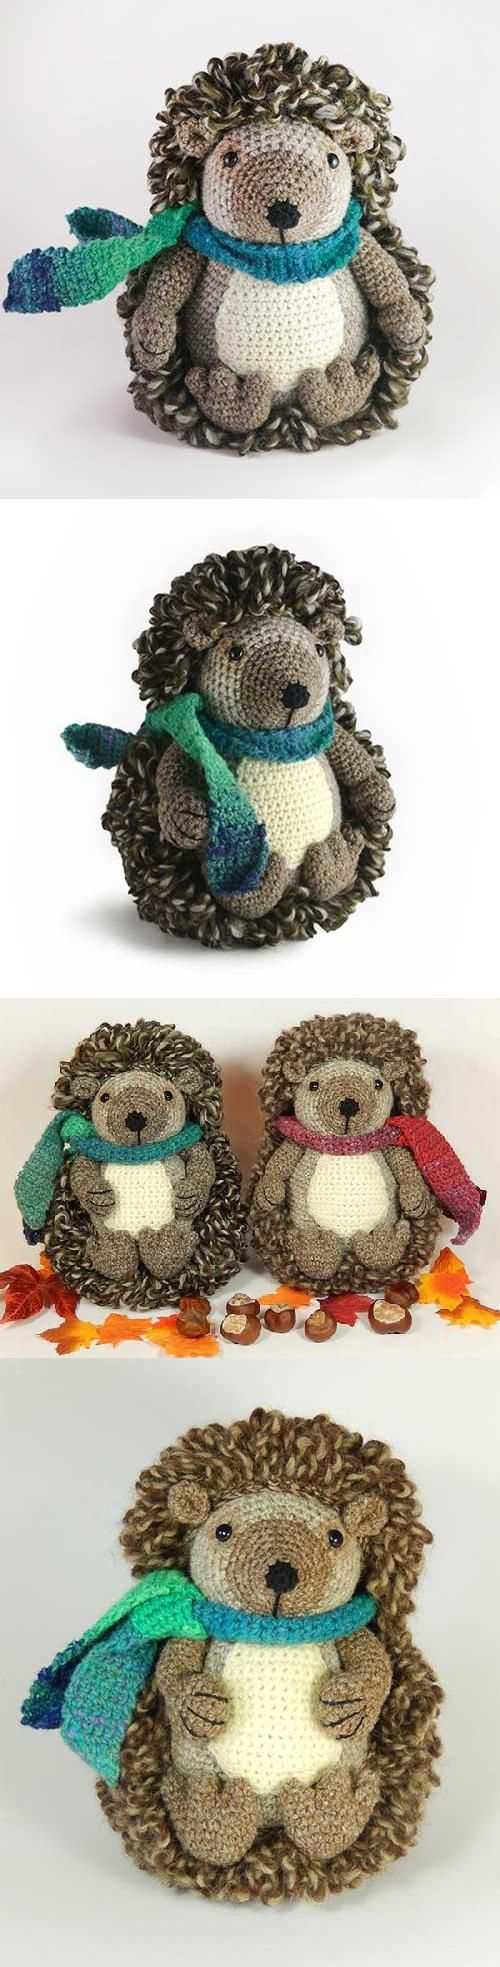 Hedley The Hedgehog Amigurumi Pattern